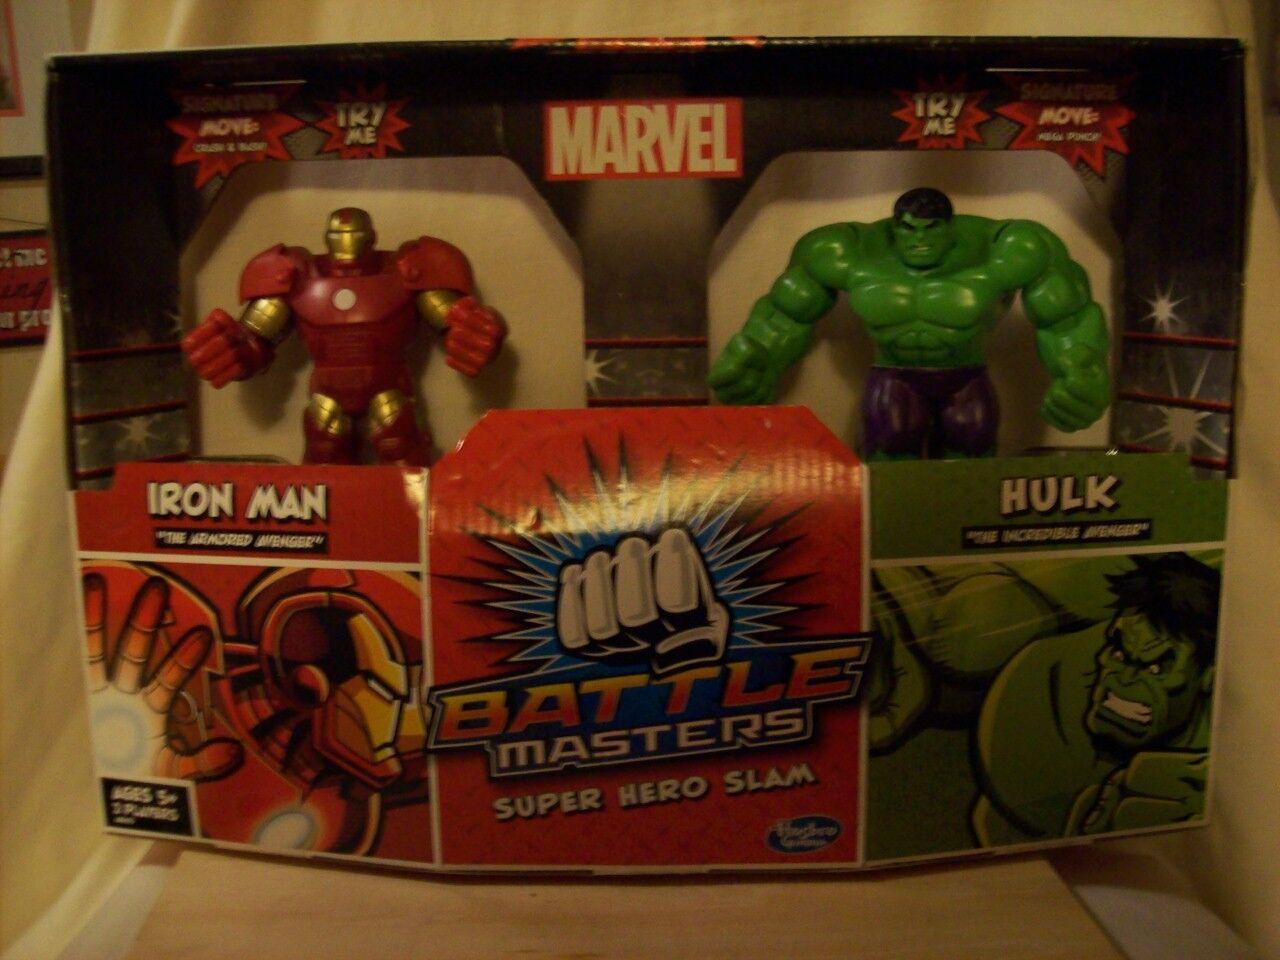 Marvel Battle Masters Super Hero Superhero Slam Iron Iron Iron Man Incredible Hulk Figures 371ad2